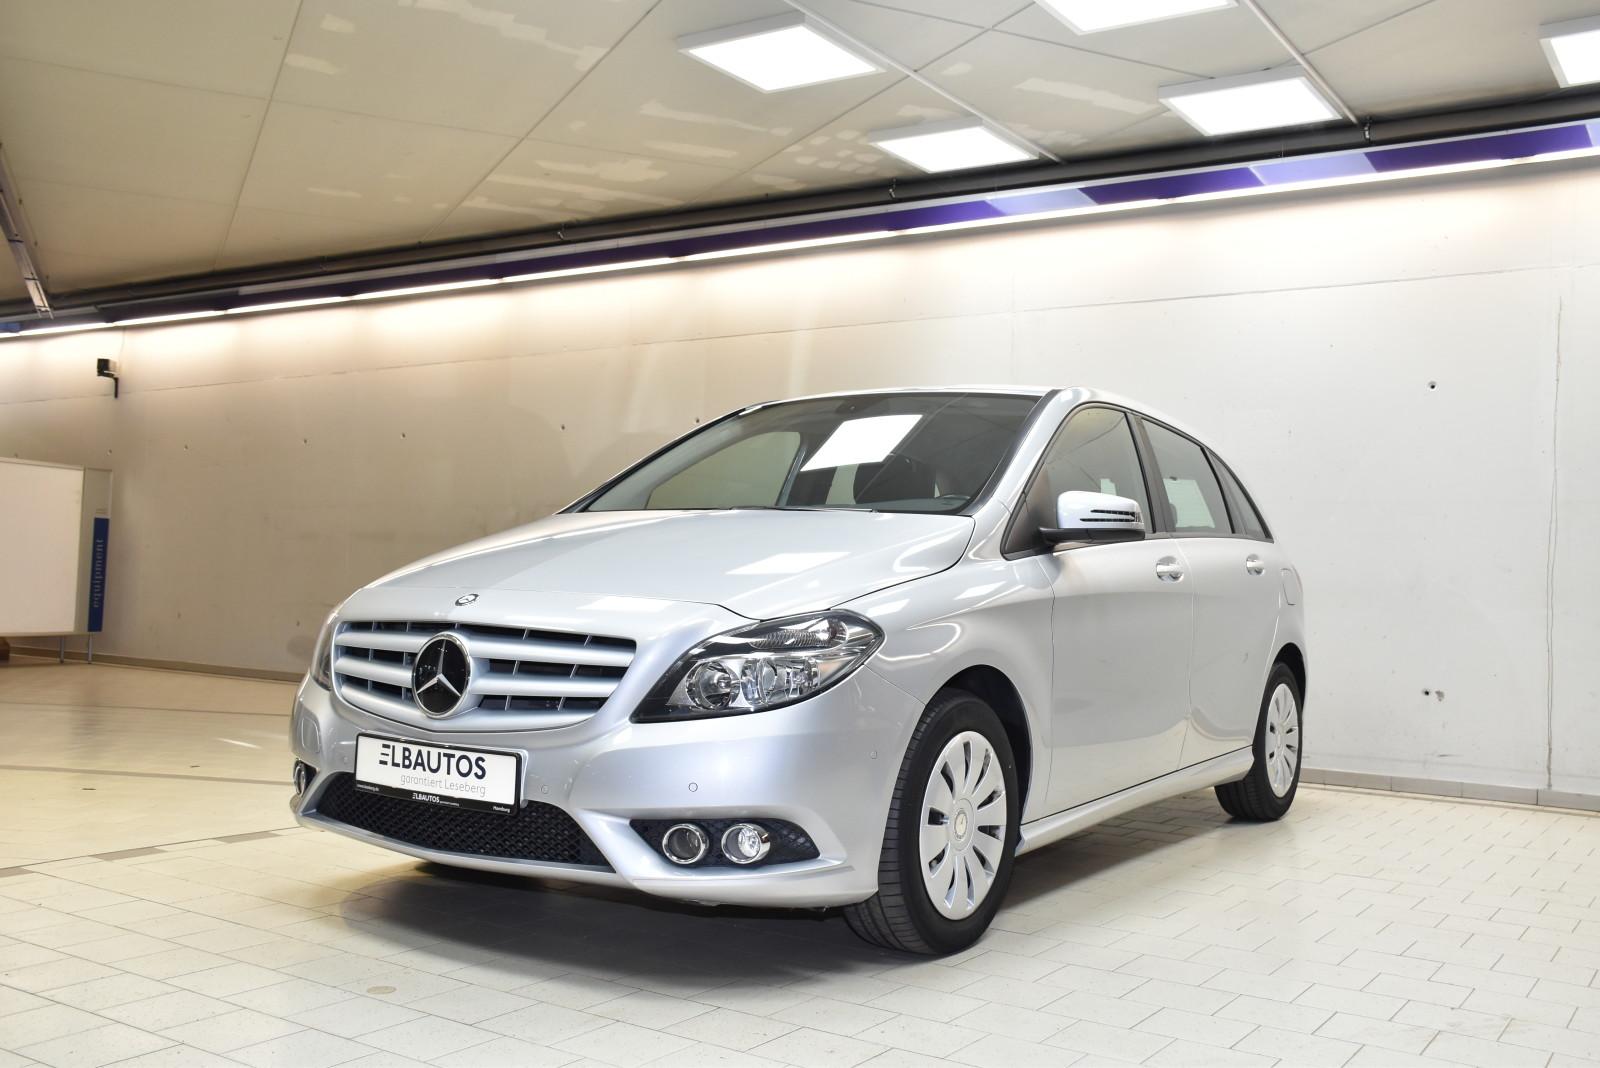 Mercedes-Benz B 220 CDI BE Rückfahkamera/Navi/7G-DCT/Sitzhzg., Jahr 2014, Diesel